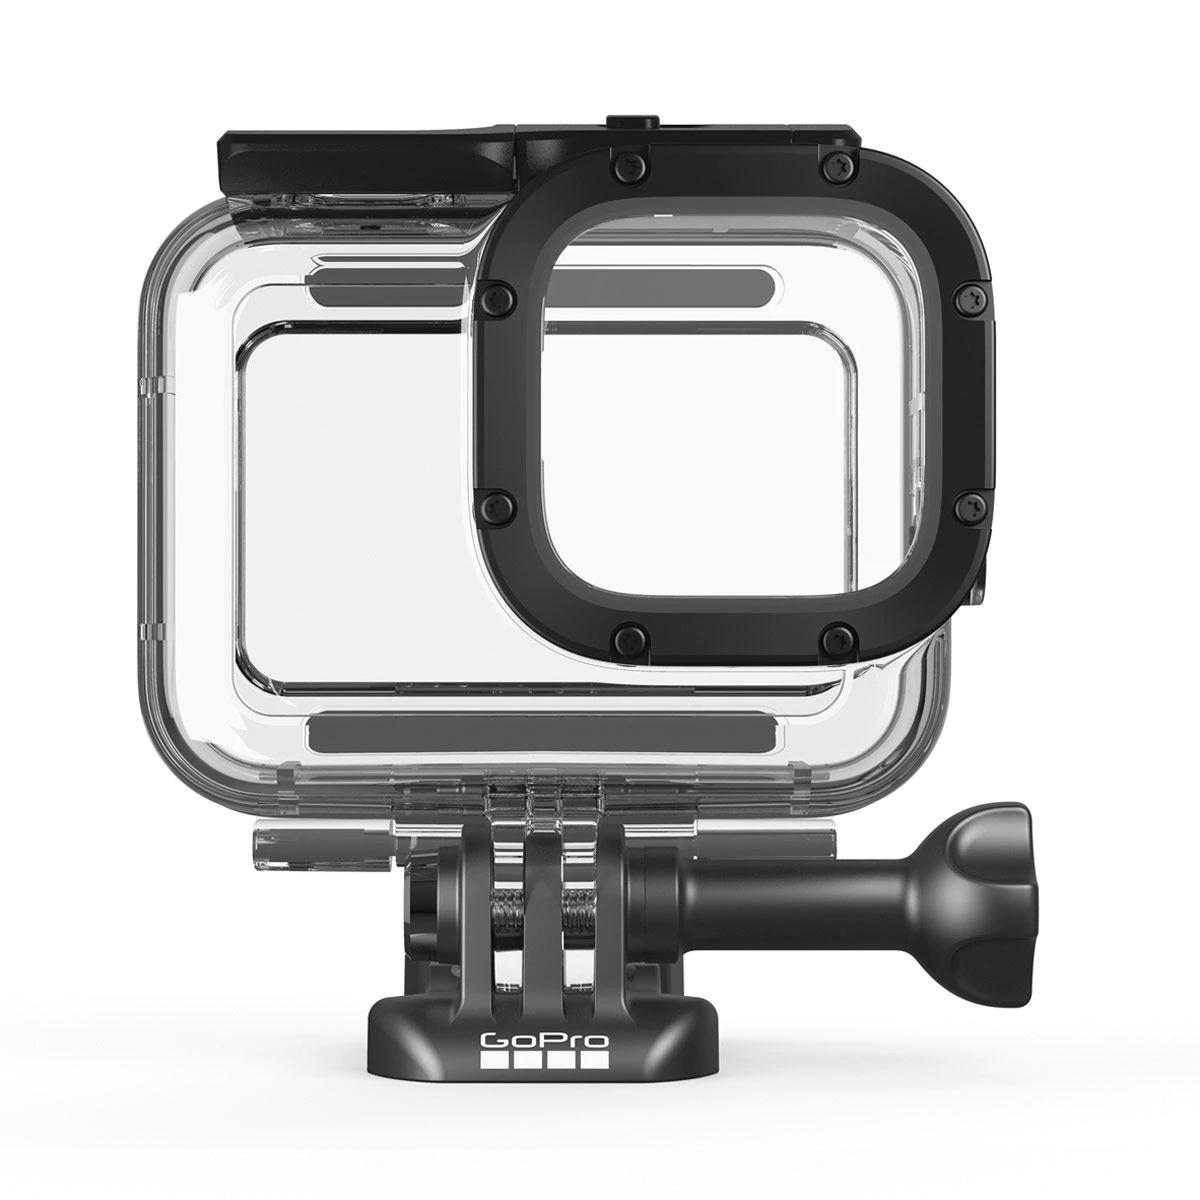 Carcasa Protectora para GoPro HERO 8 ORIGINAL